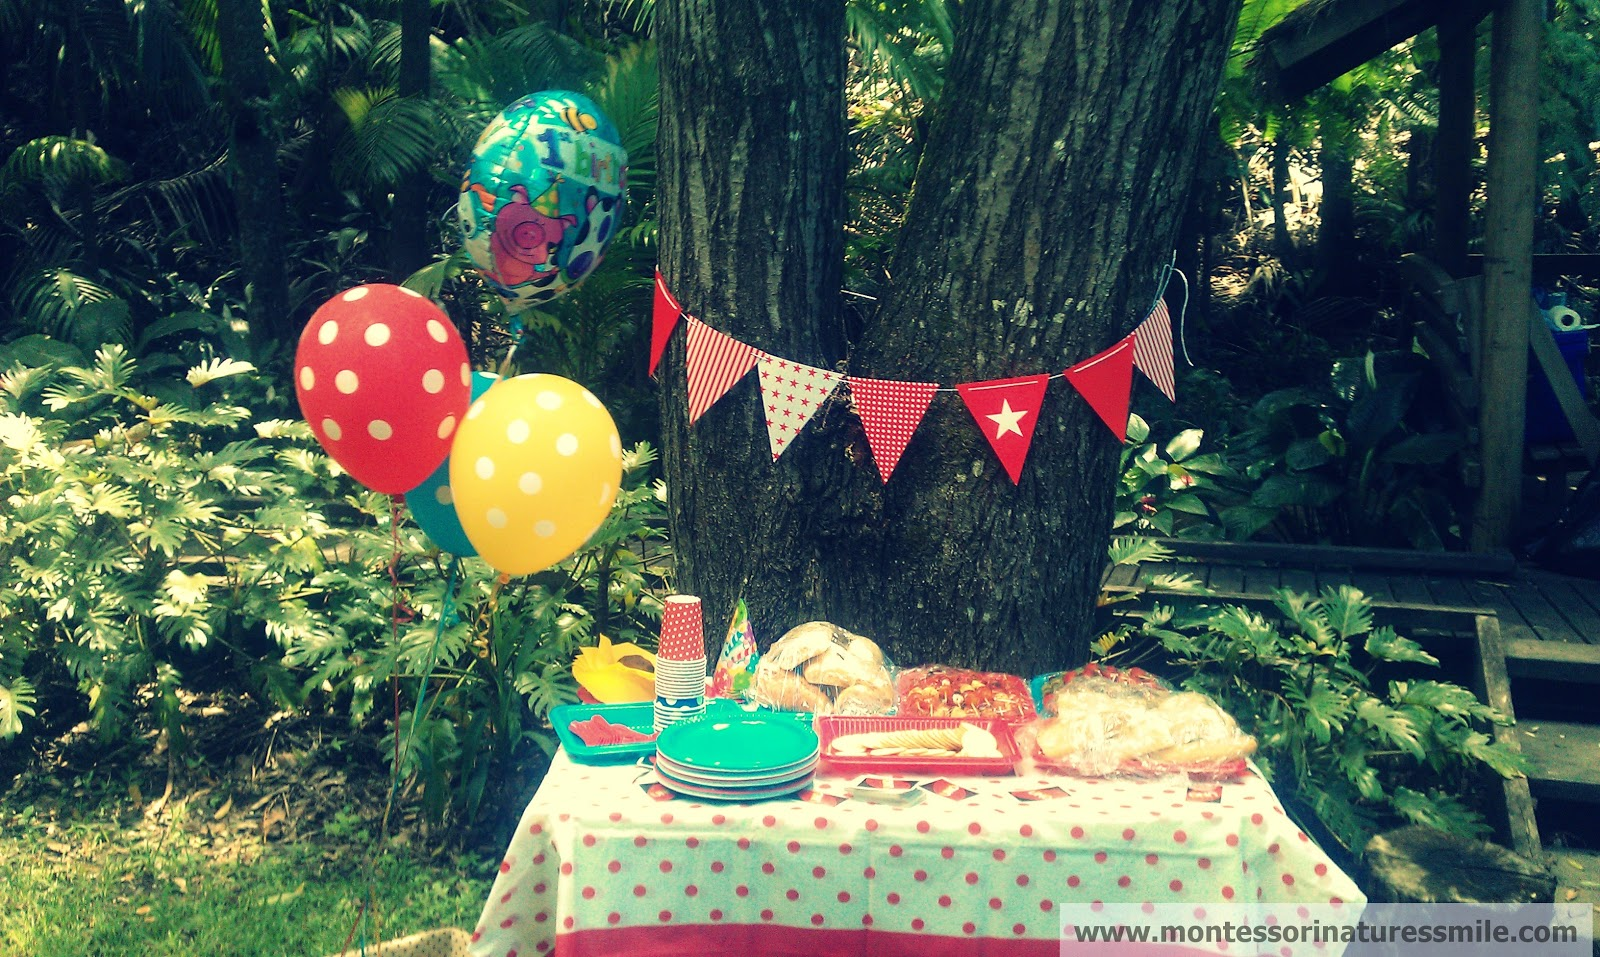 First Birthday Party Ideas - Montessori Nature